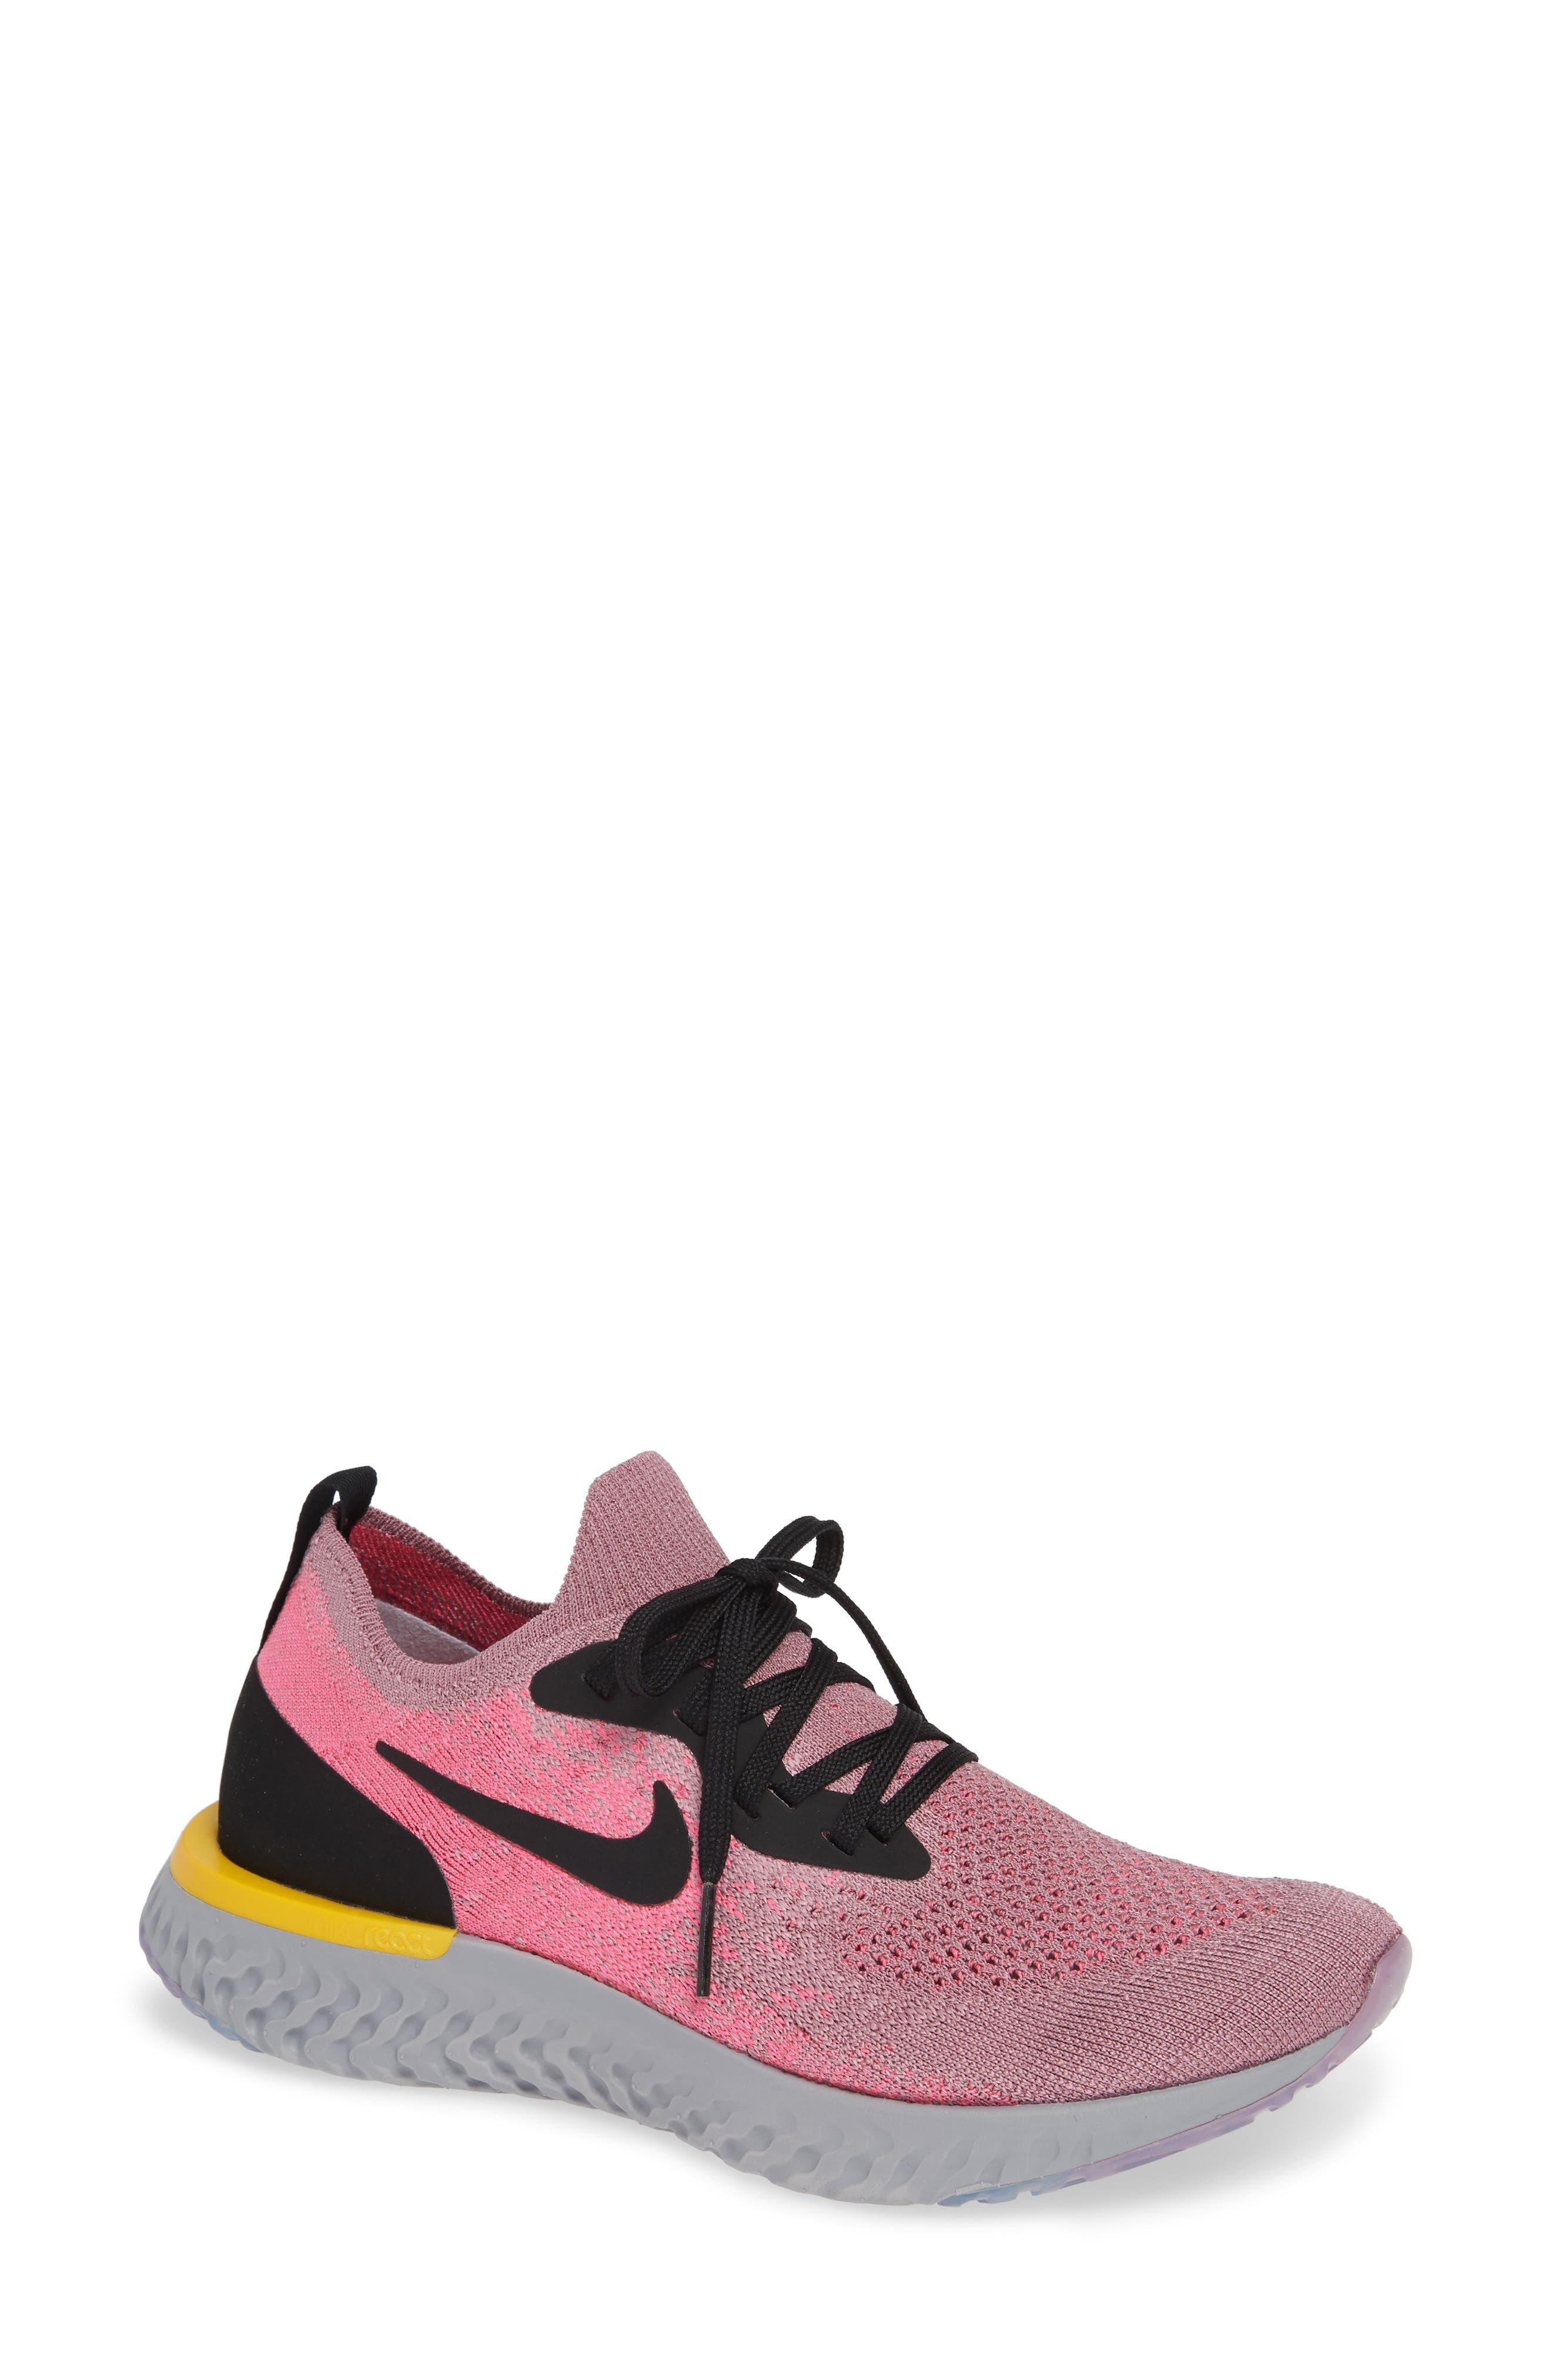 Nike | Epic React Flyknit Running Shoe